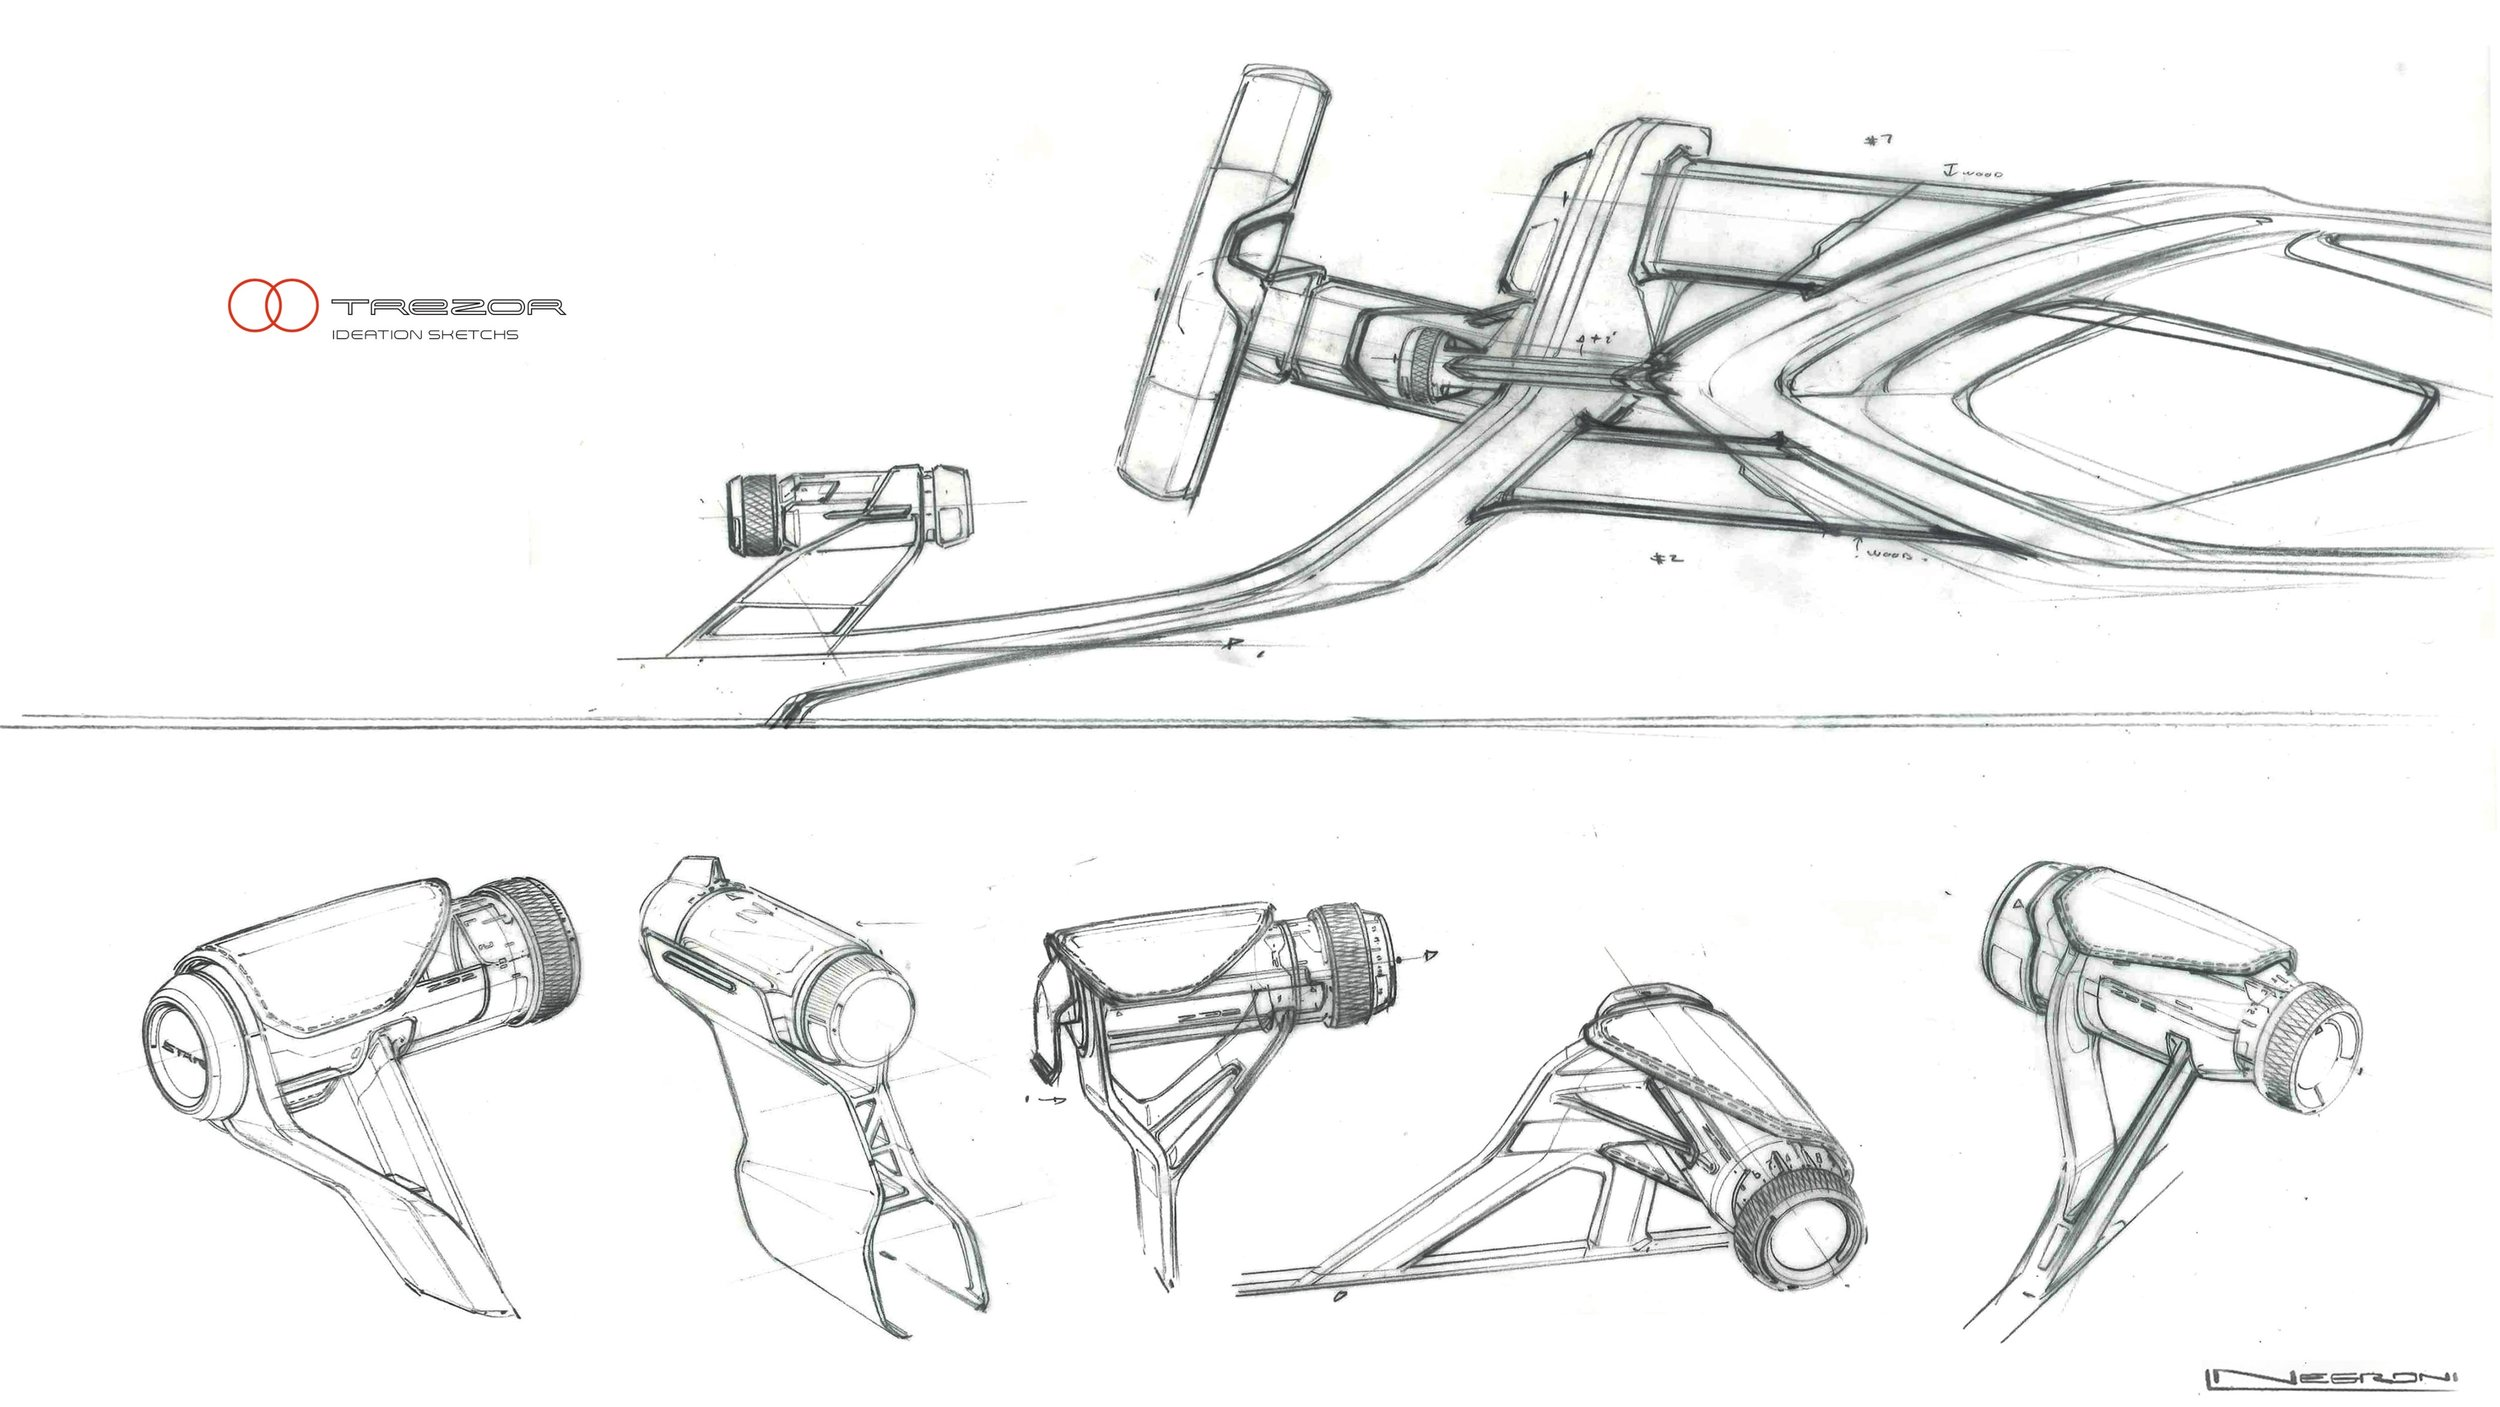 Trezor Concept Design - EMBARGO 08h15 UK Time 290916 (25).JPG